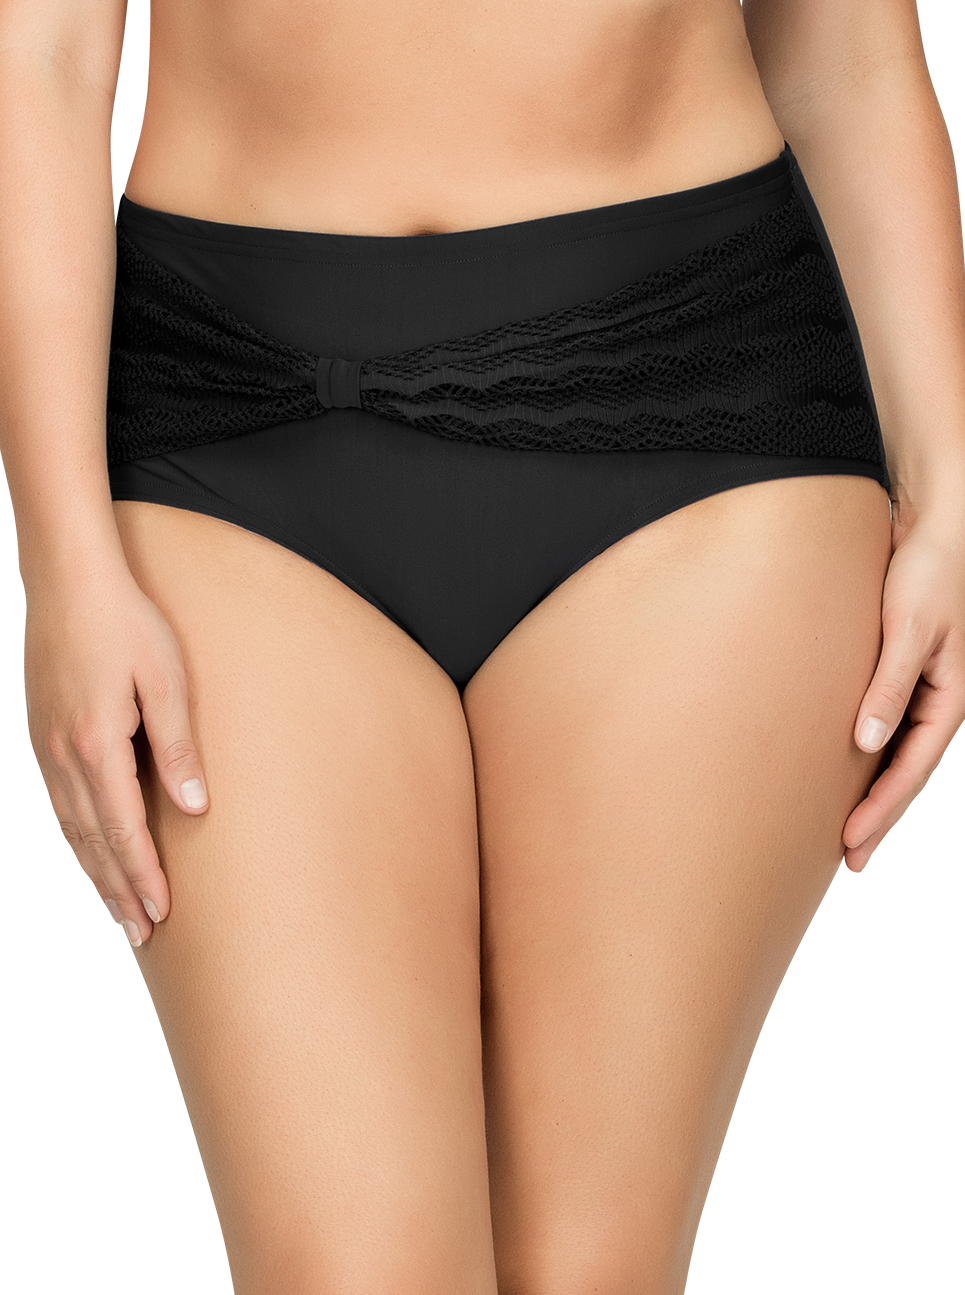 PARFAIT Keira HighWaistBikiniBottomS8075 Black Front1 - Keira High-Waist Bikini Bottom Black S8075